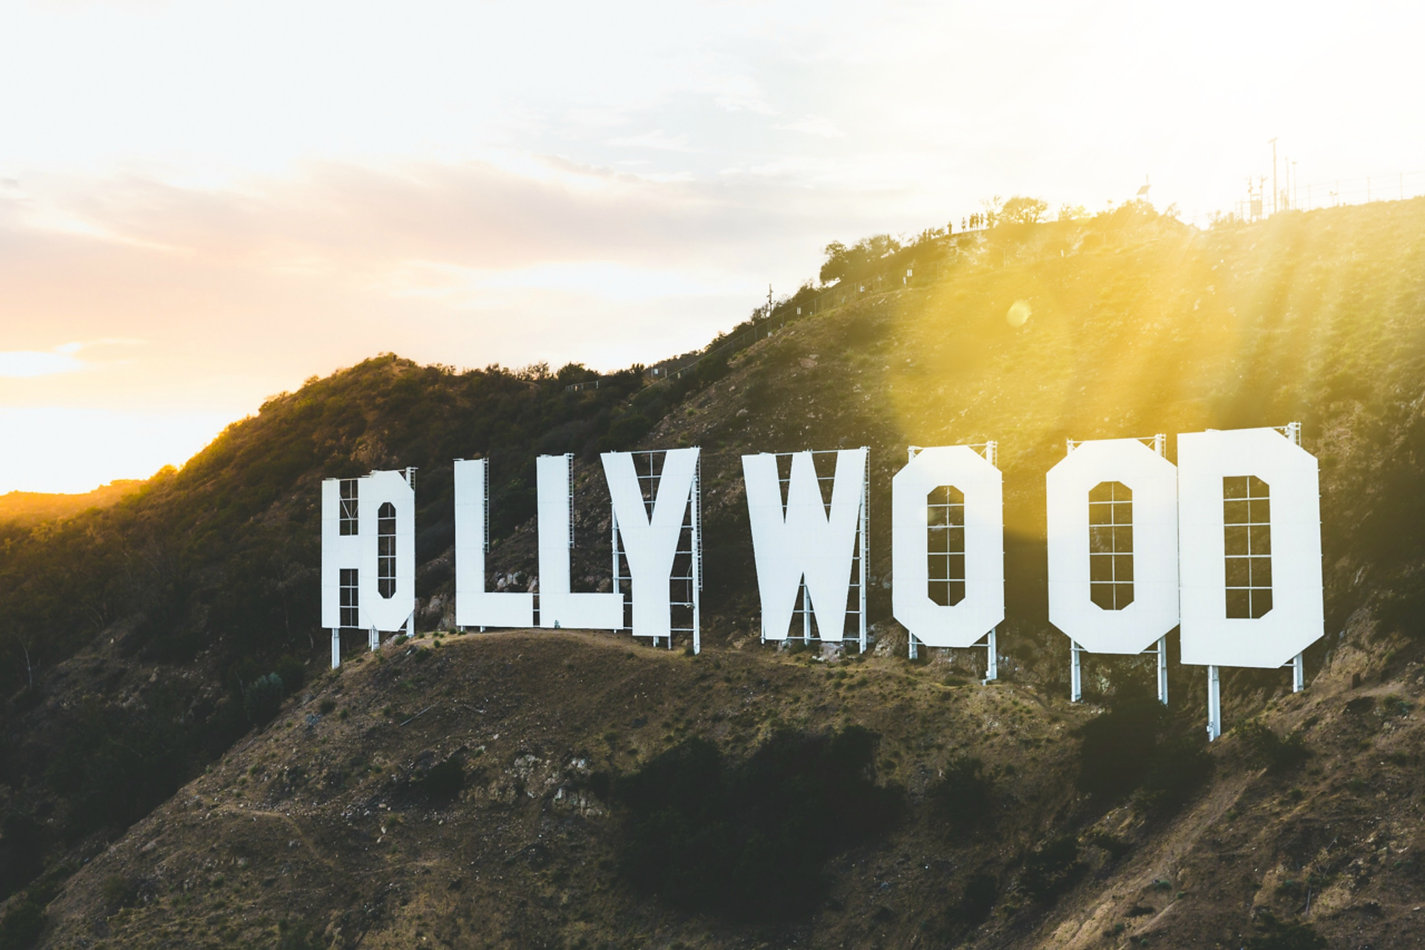 Hollywood_edited.jpg